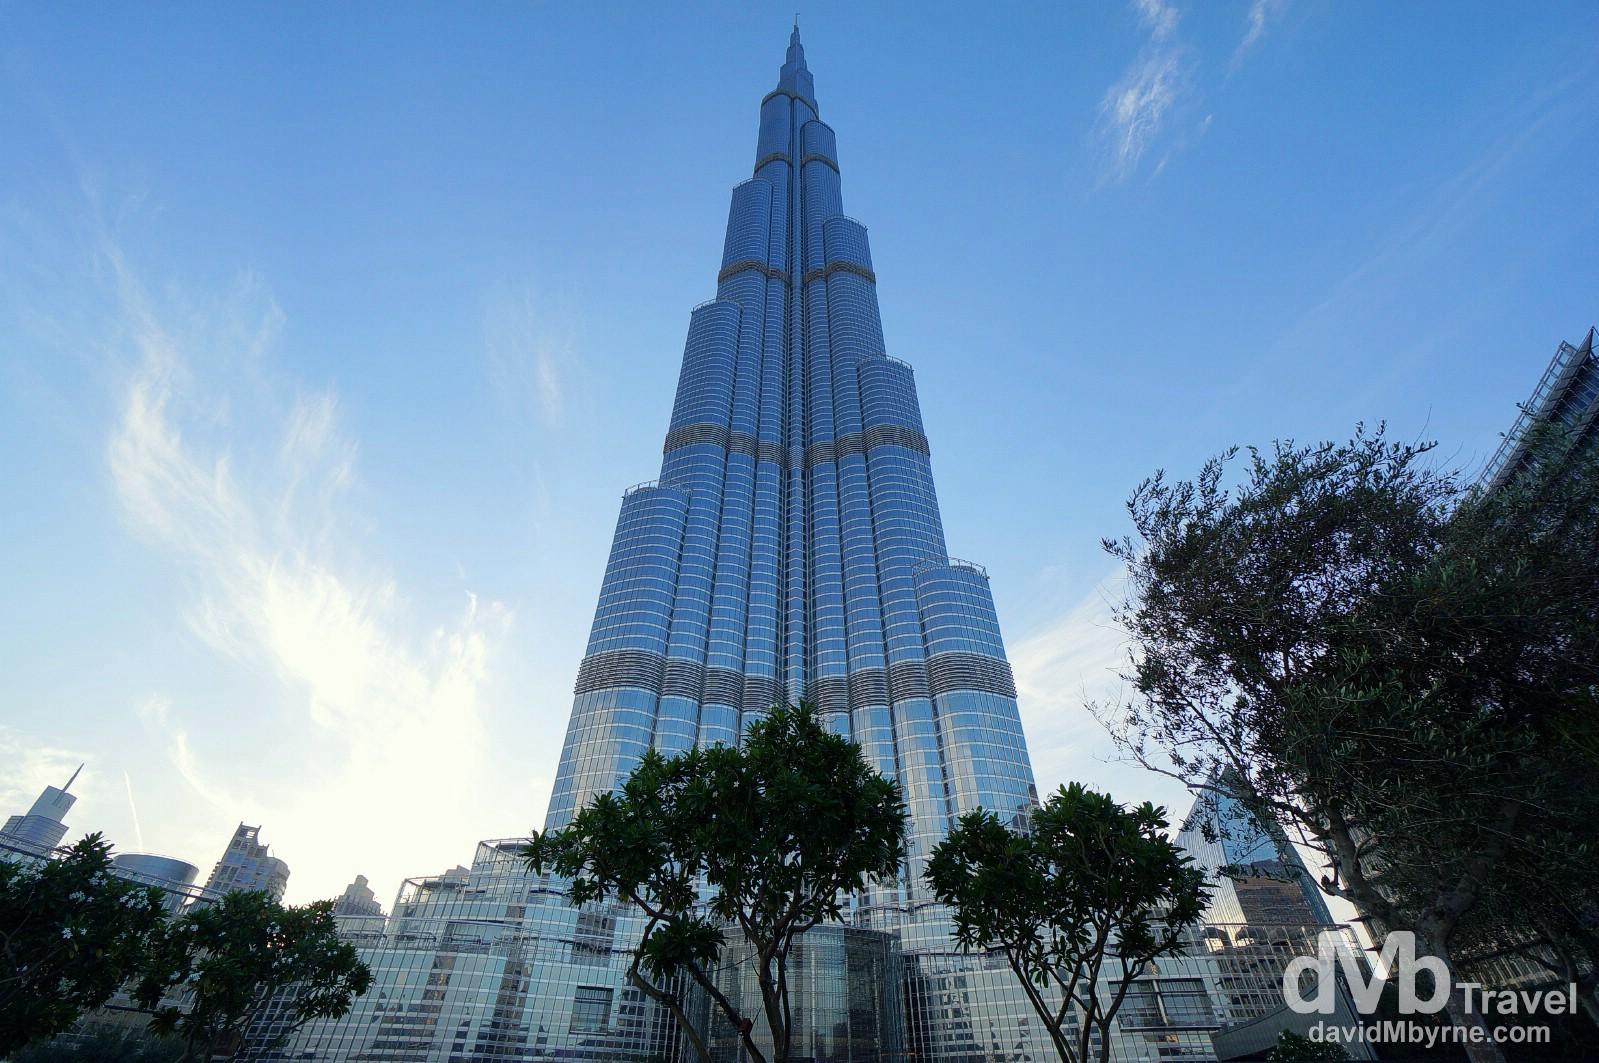 At the foot of the Burj Khalifa in Downtown Dubai, UAE. April 18th, 2014.